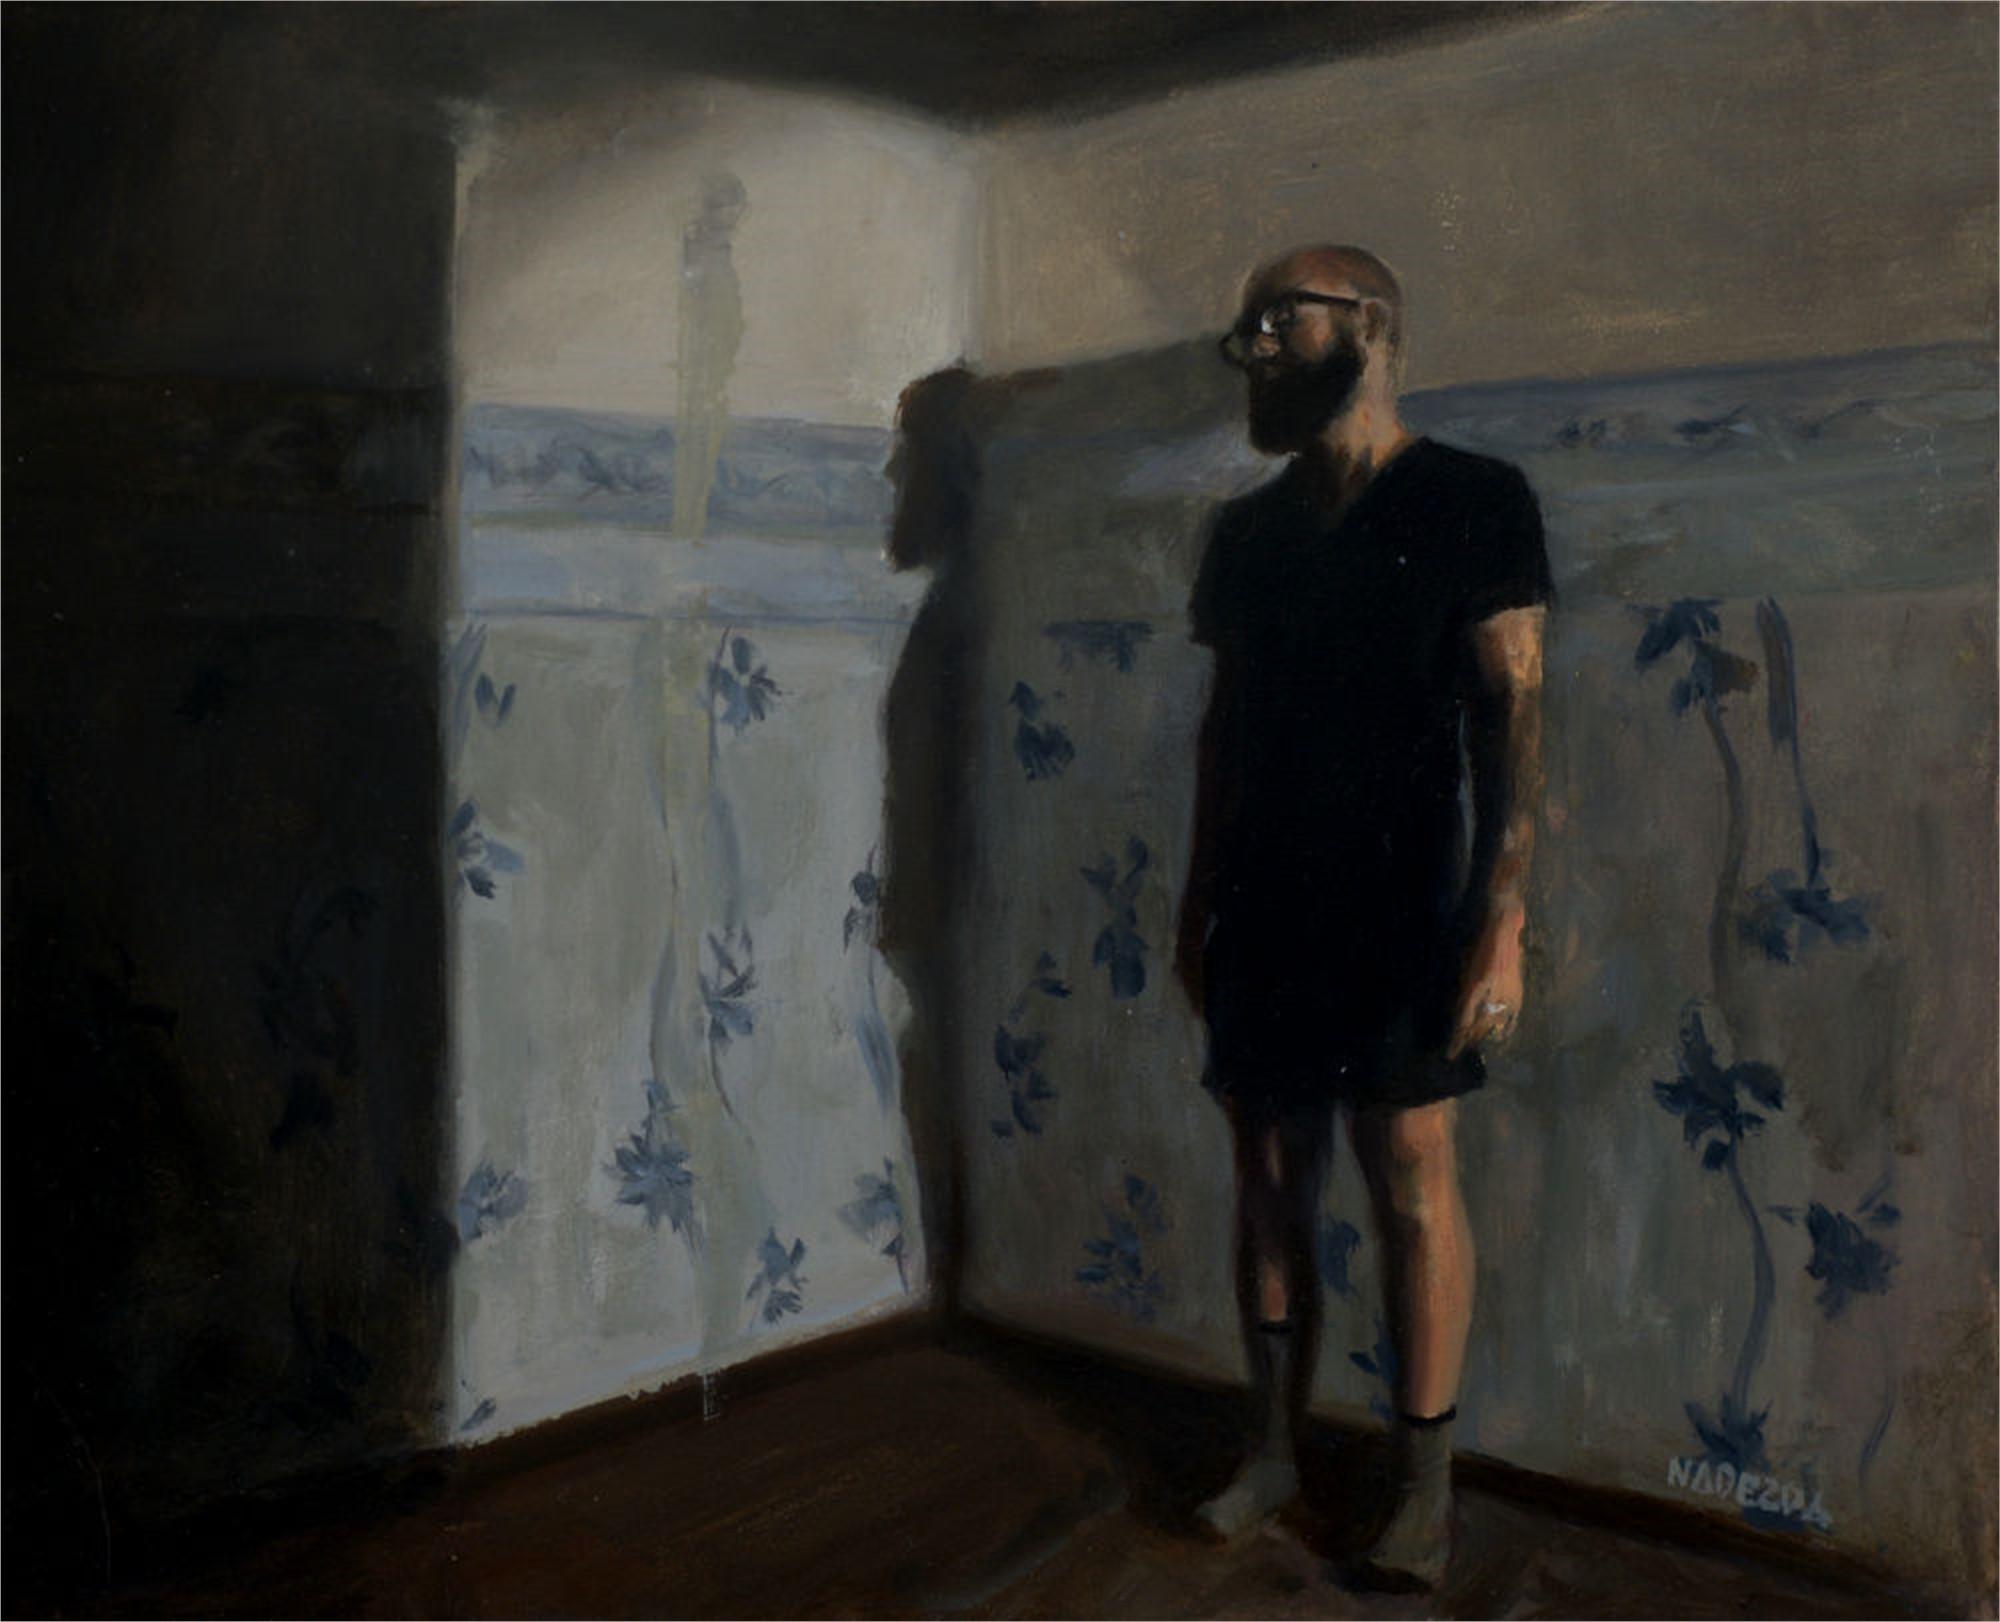 When It's Dark by Nadezda